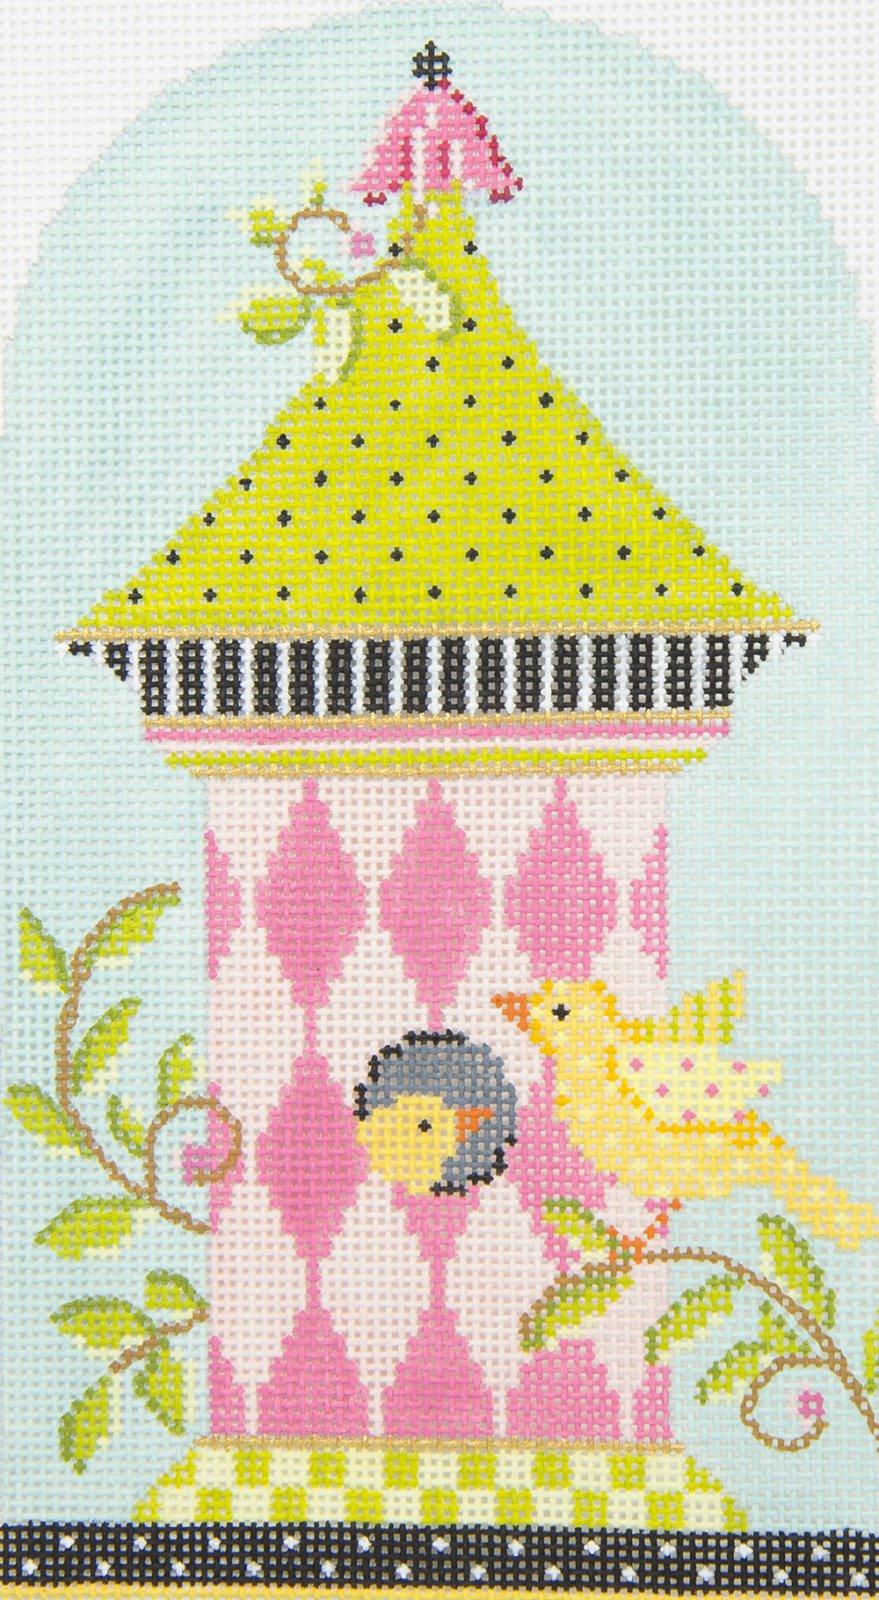 KBH03 Pink Harlequin Birdhouse Kelly Clark